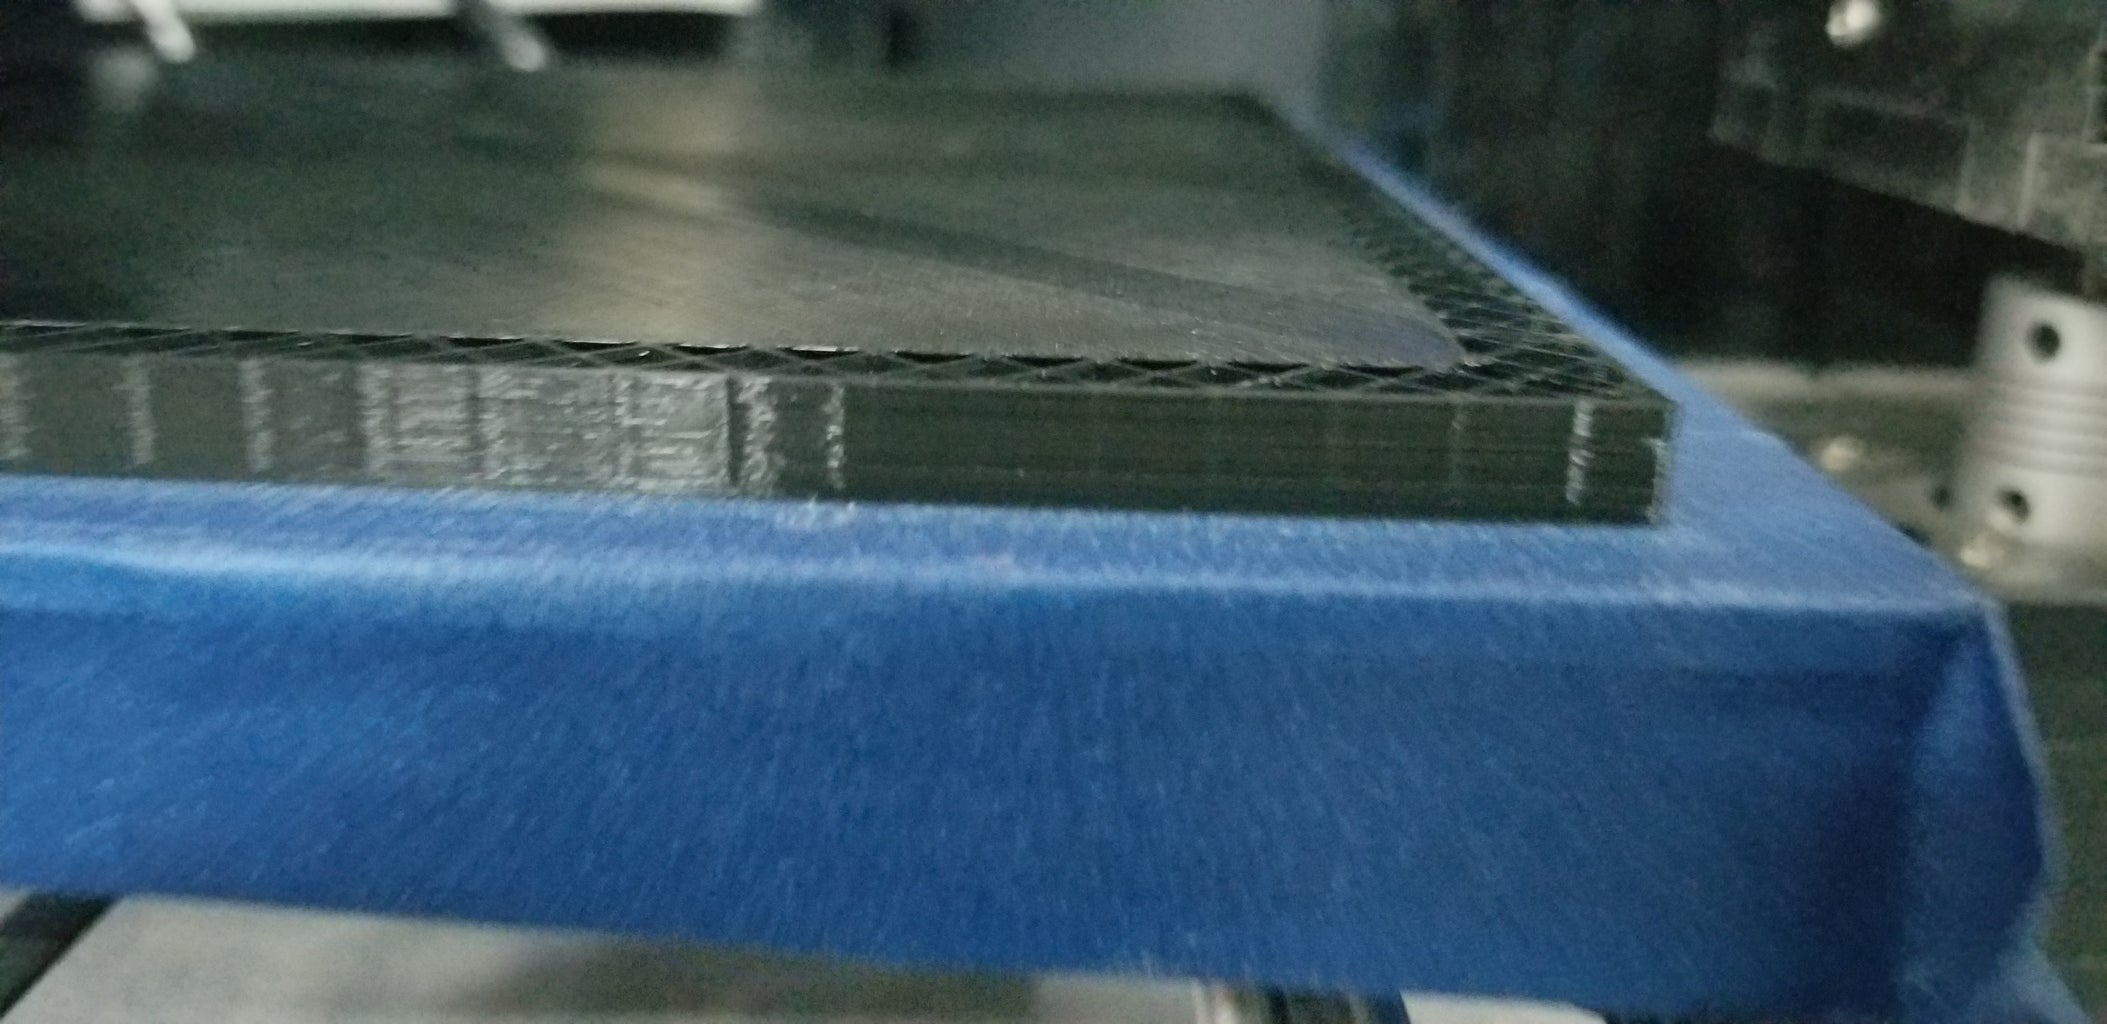 Printing, Failing, Printing